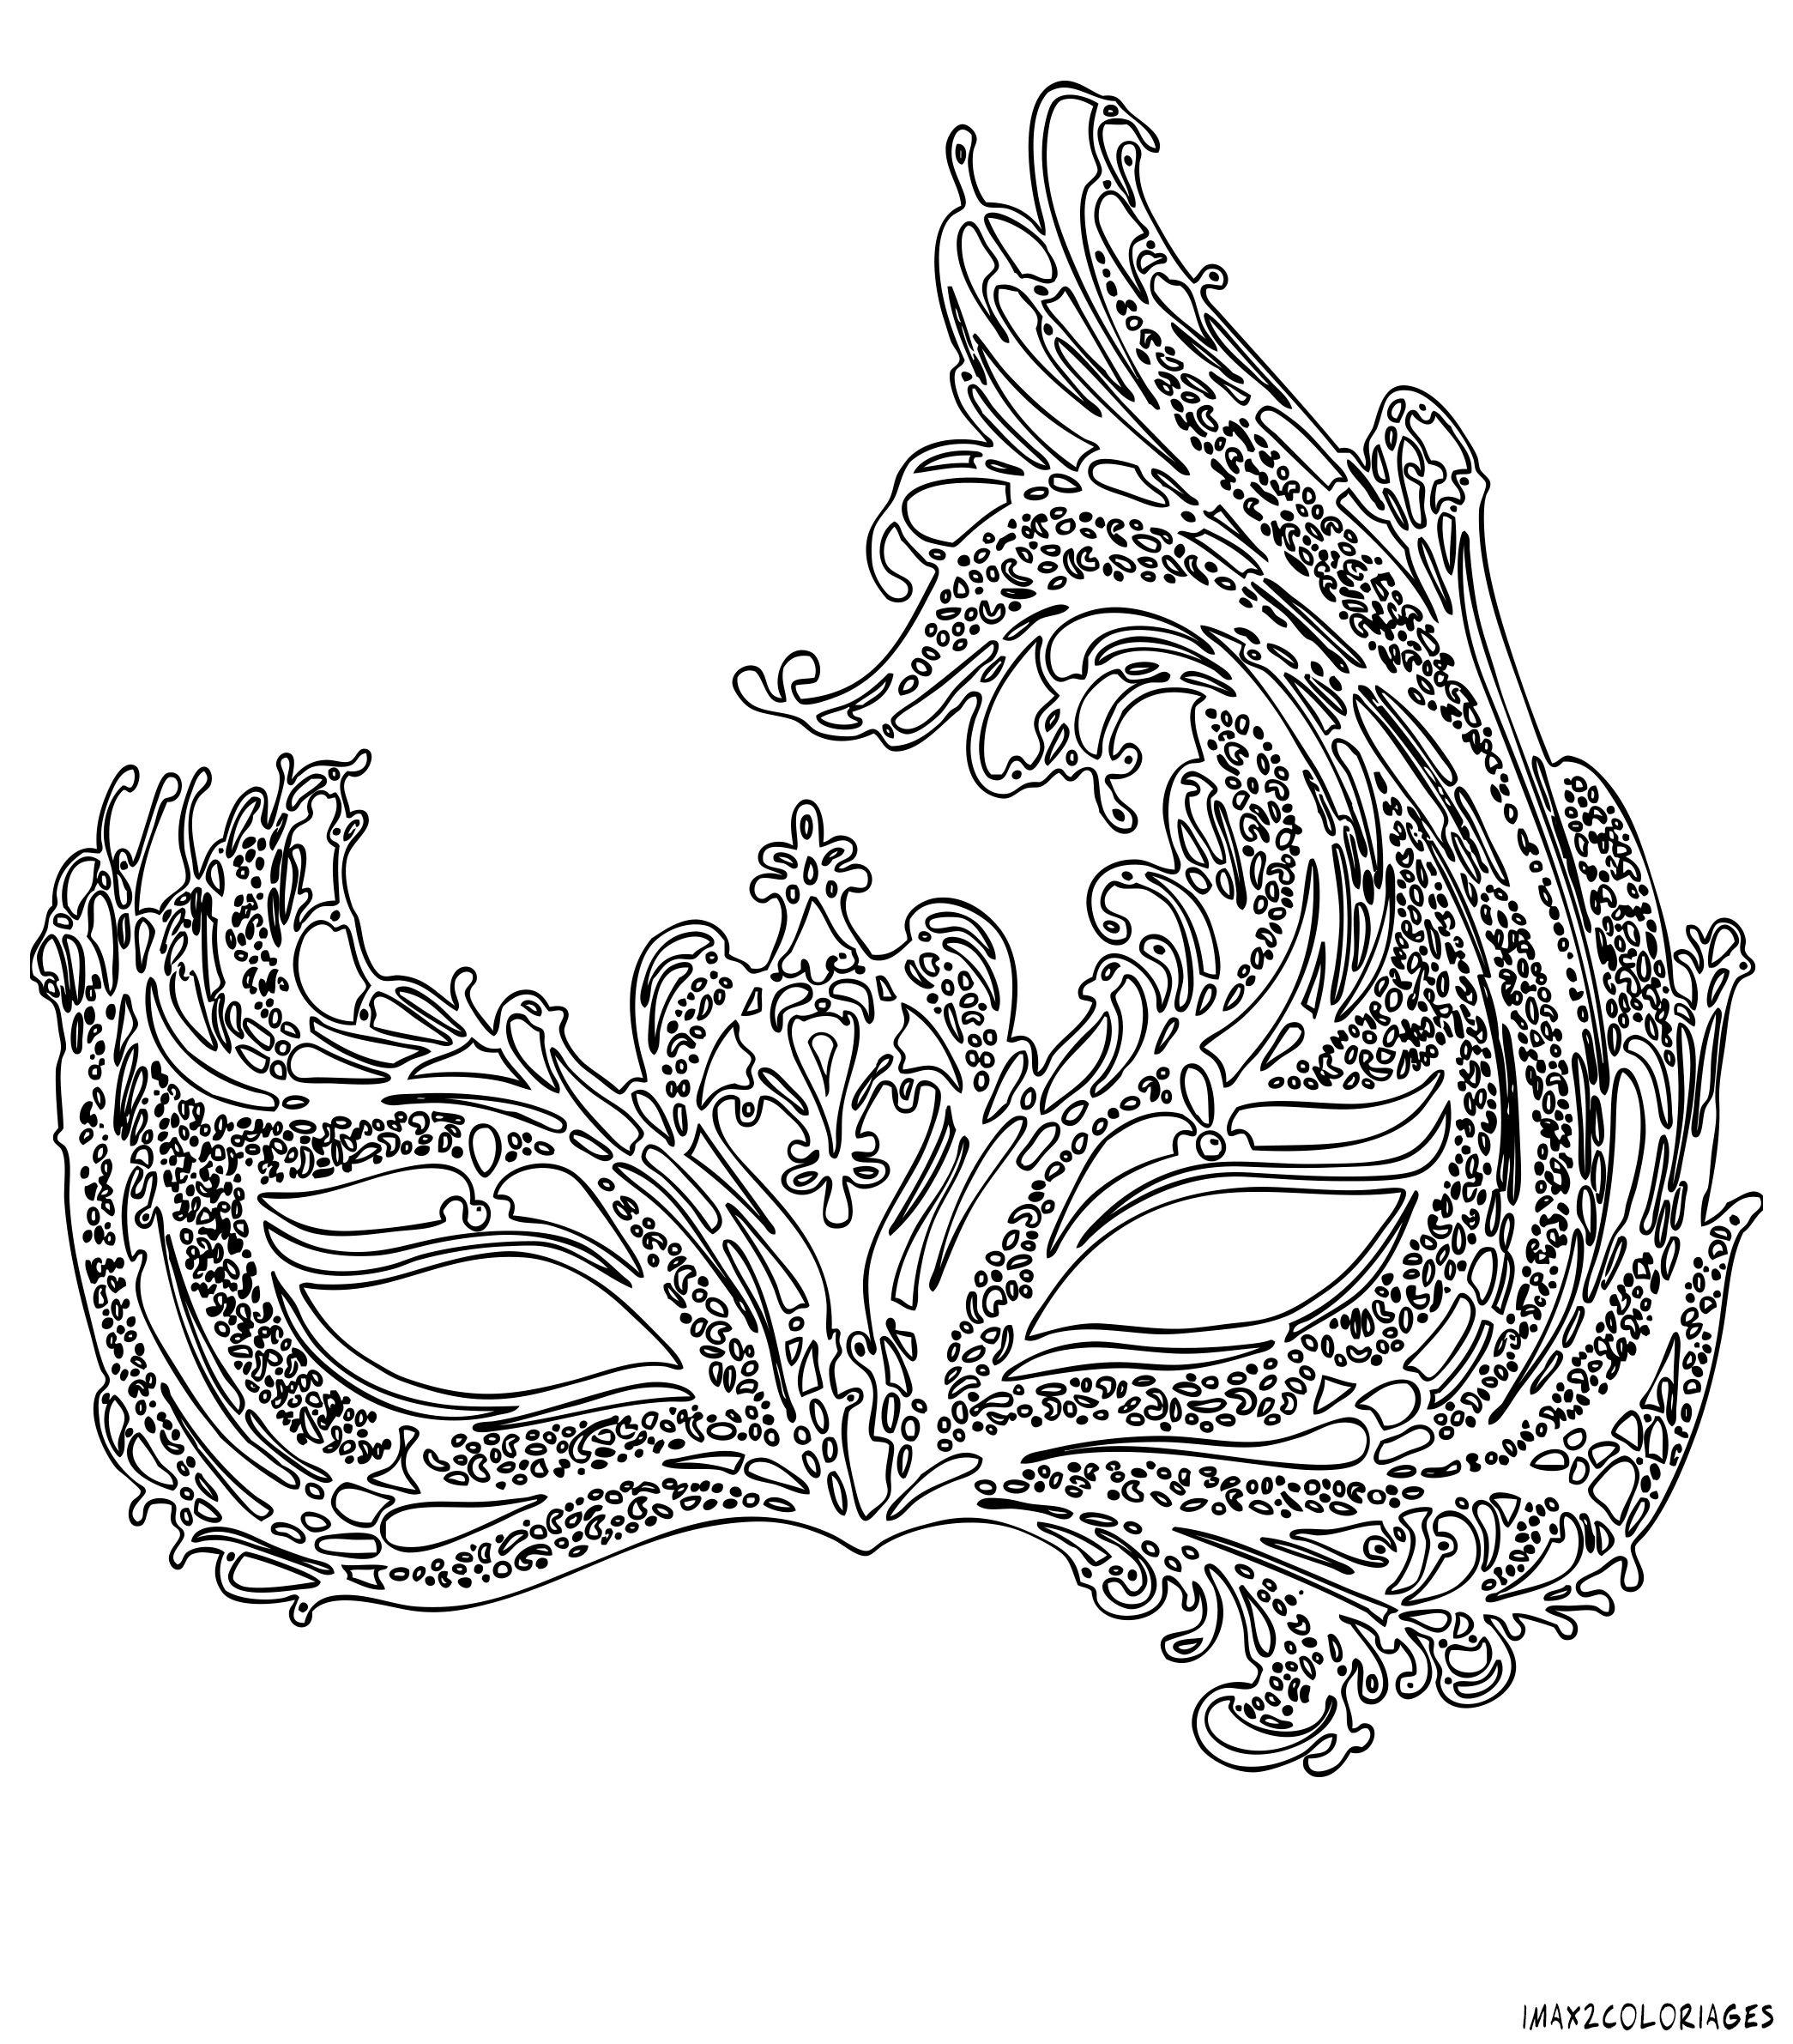 coloriage masque vénitien grande image | Printable adult ...